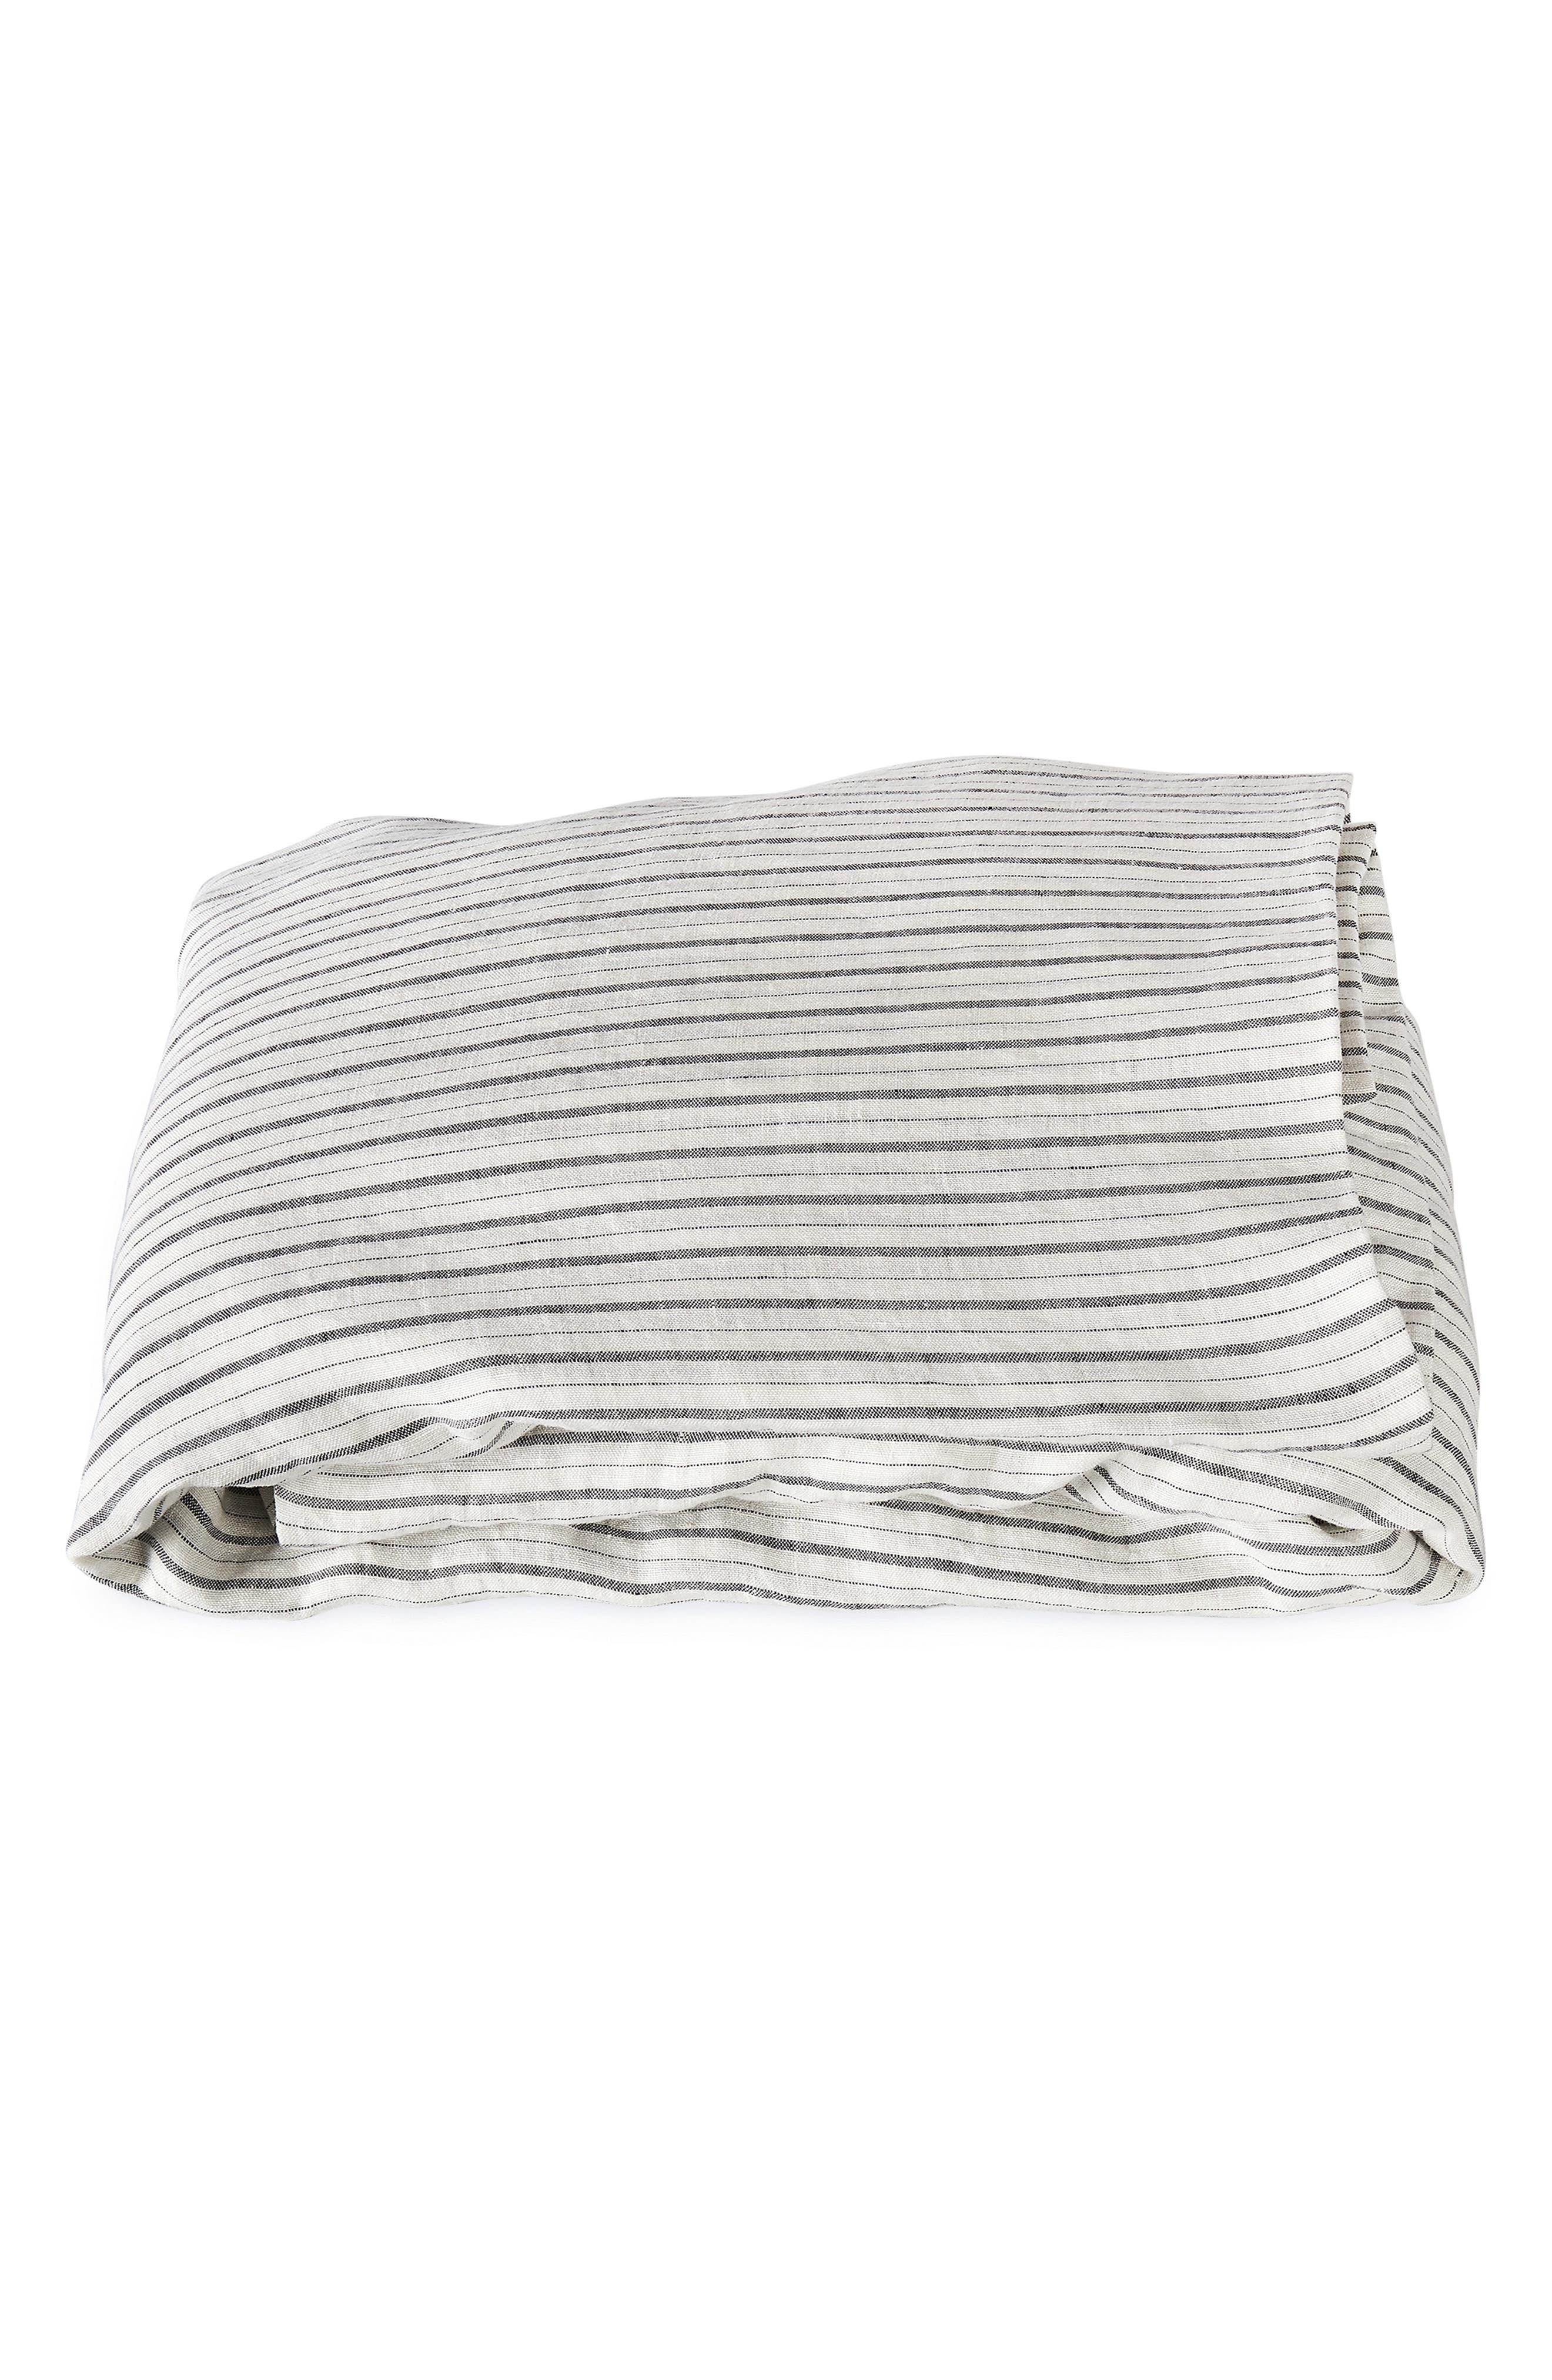 Matouk Tristen Linen Fitted Sheet Size California King  White